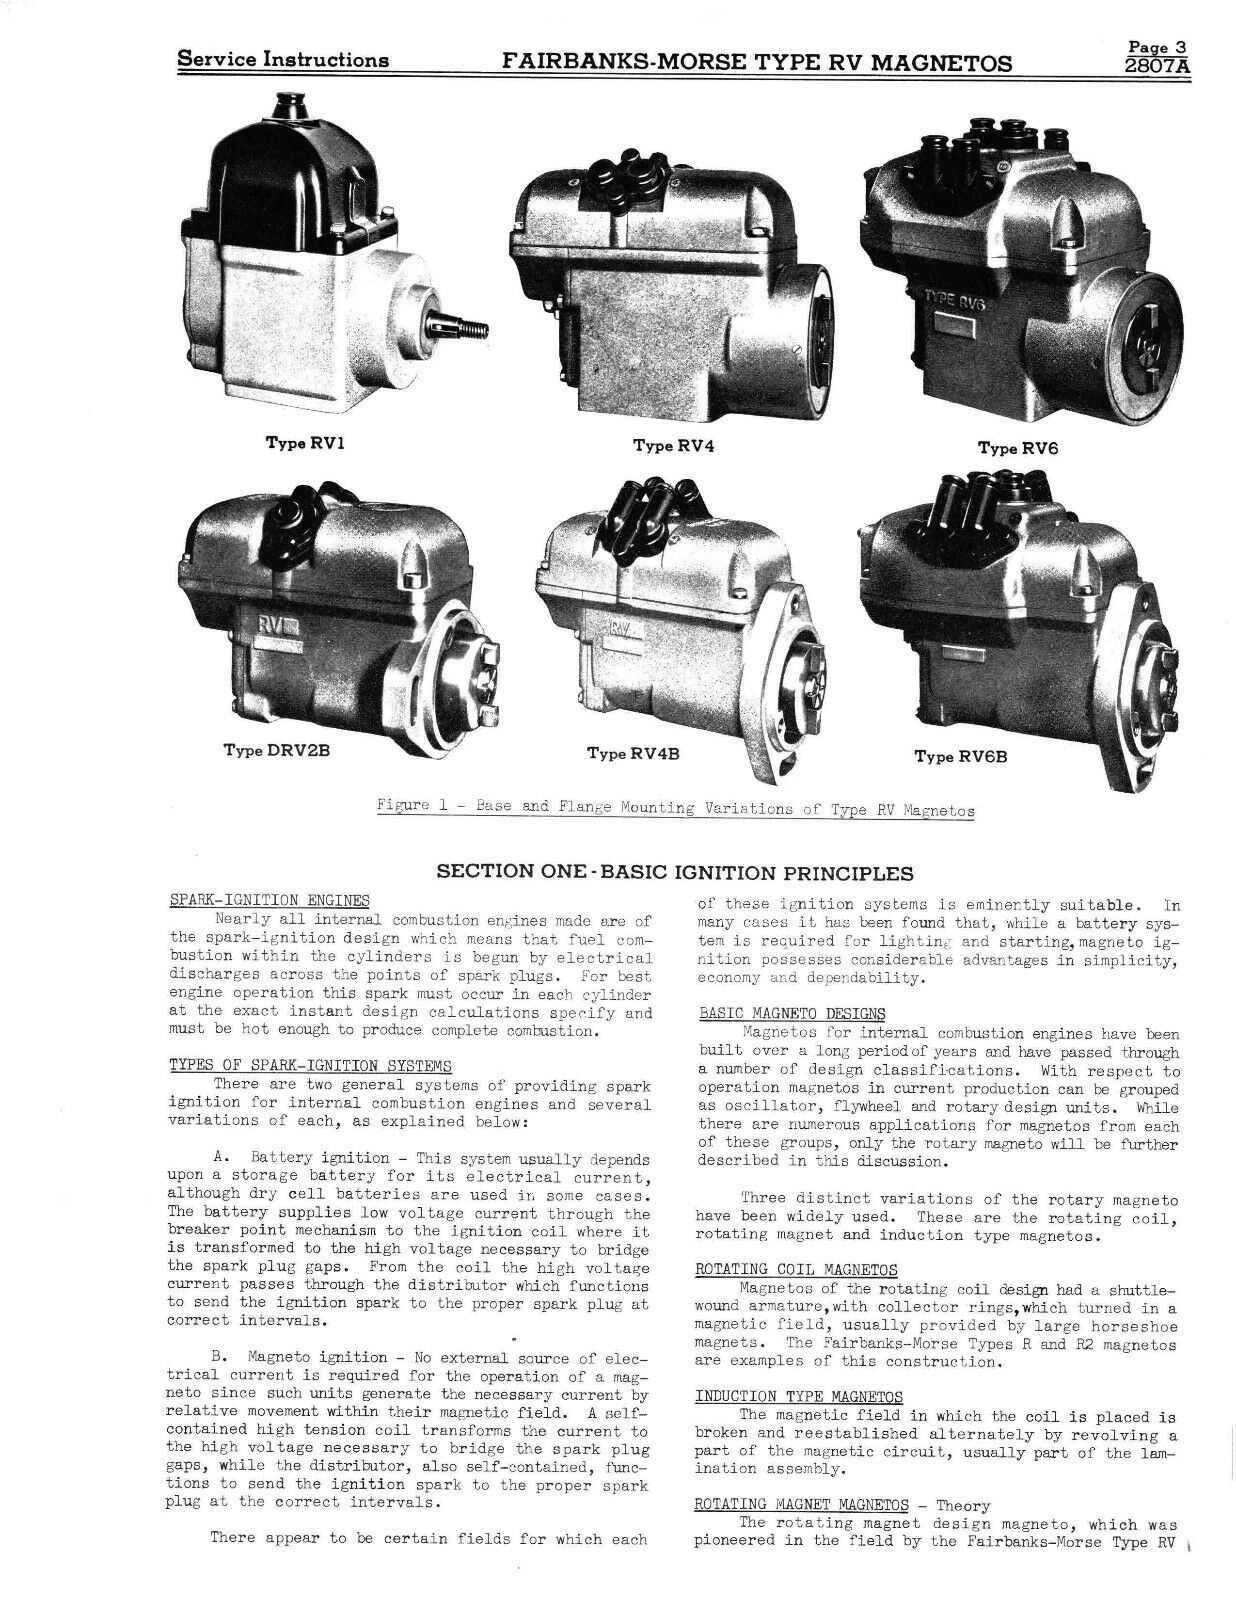 Fairbanks Morse Magneto Service & Parts Manual for RV Series Mags *434 |  eBay